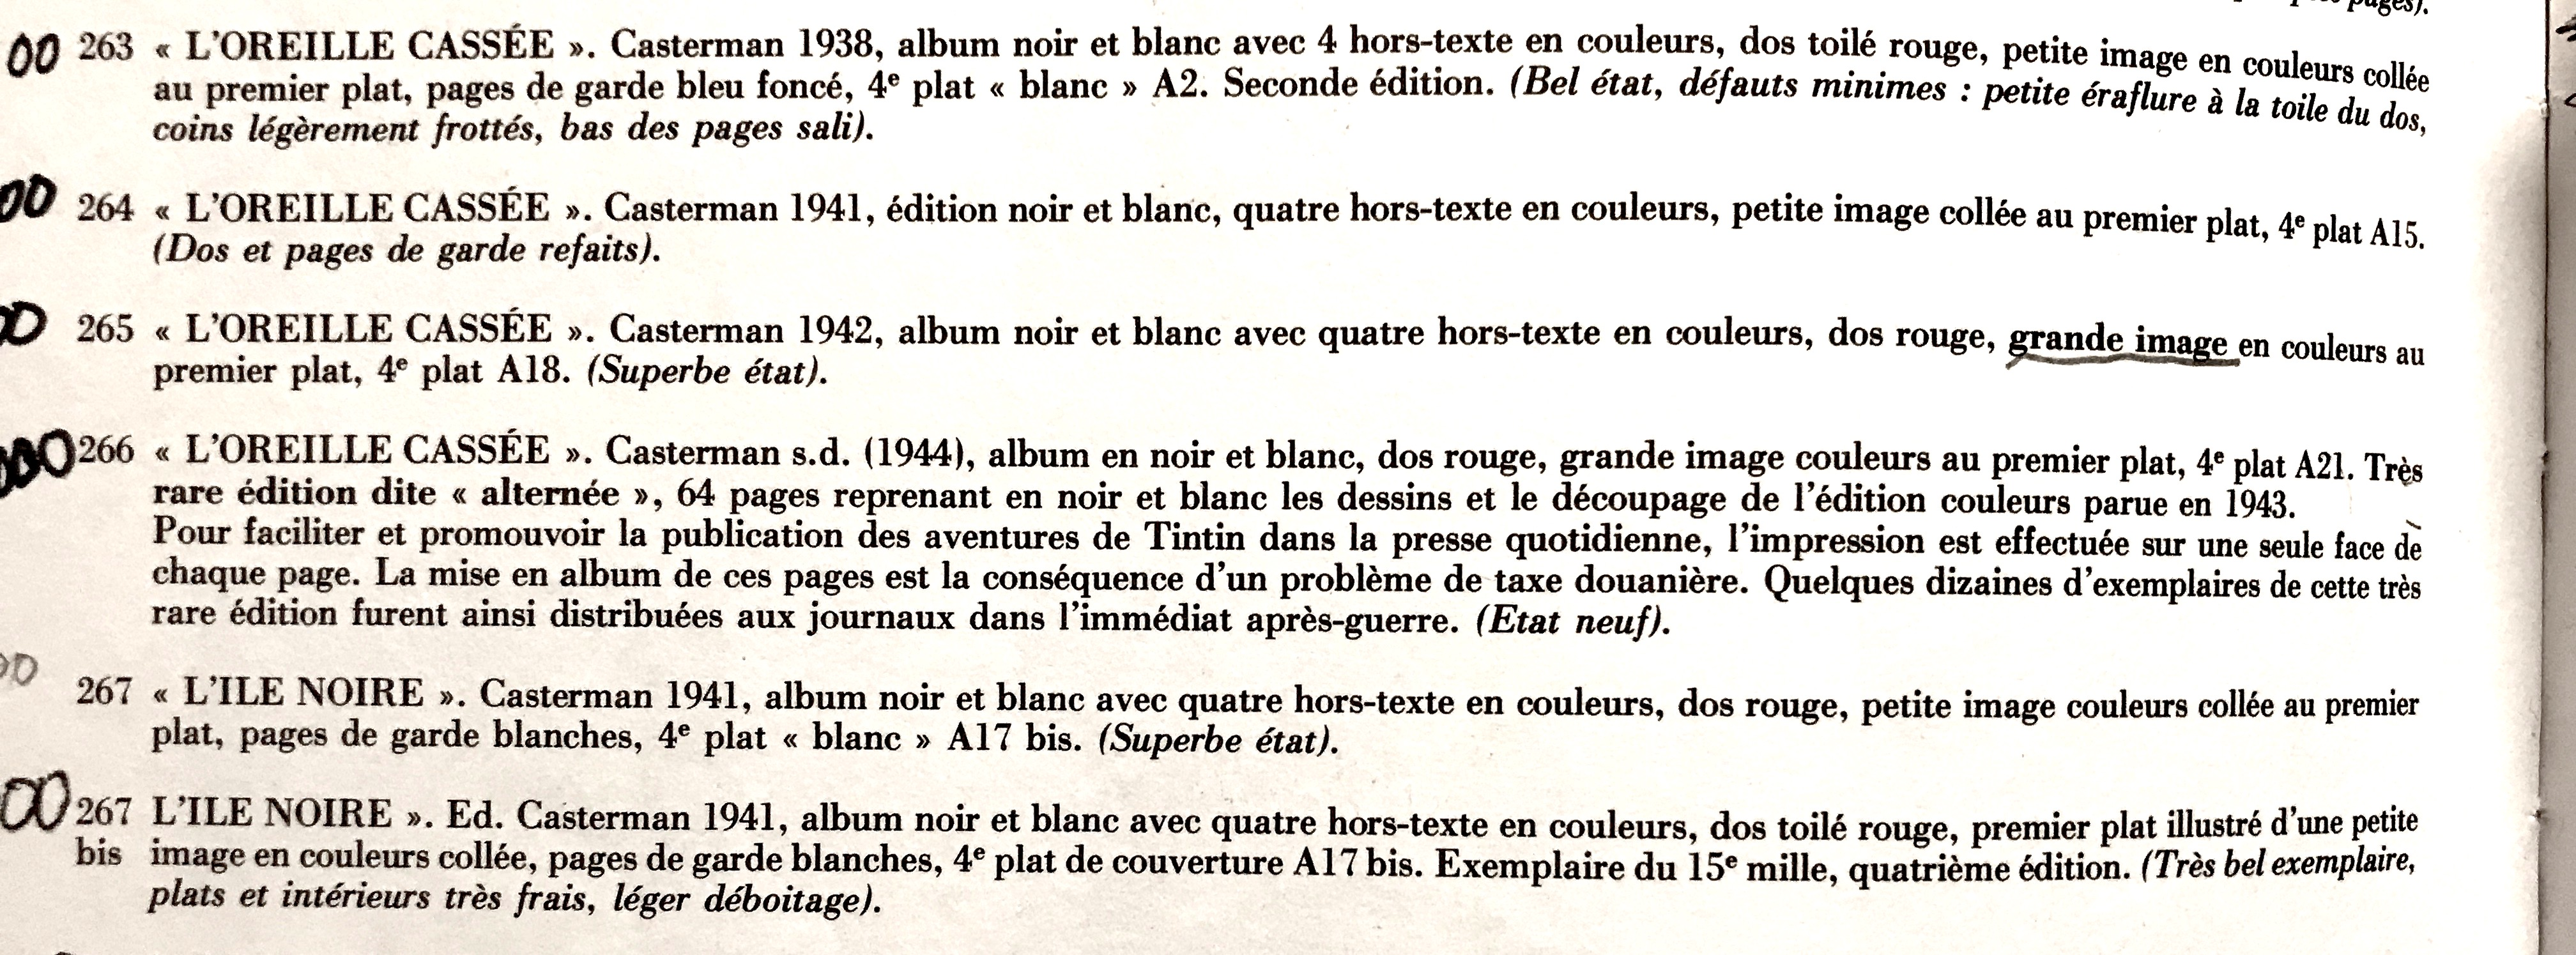 Première apparition d'une « Oreille cassée » alternée vente Tintinomania 1990. Adjugée 28 000 FF.